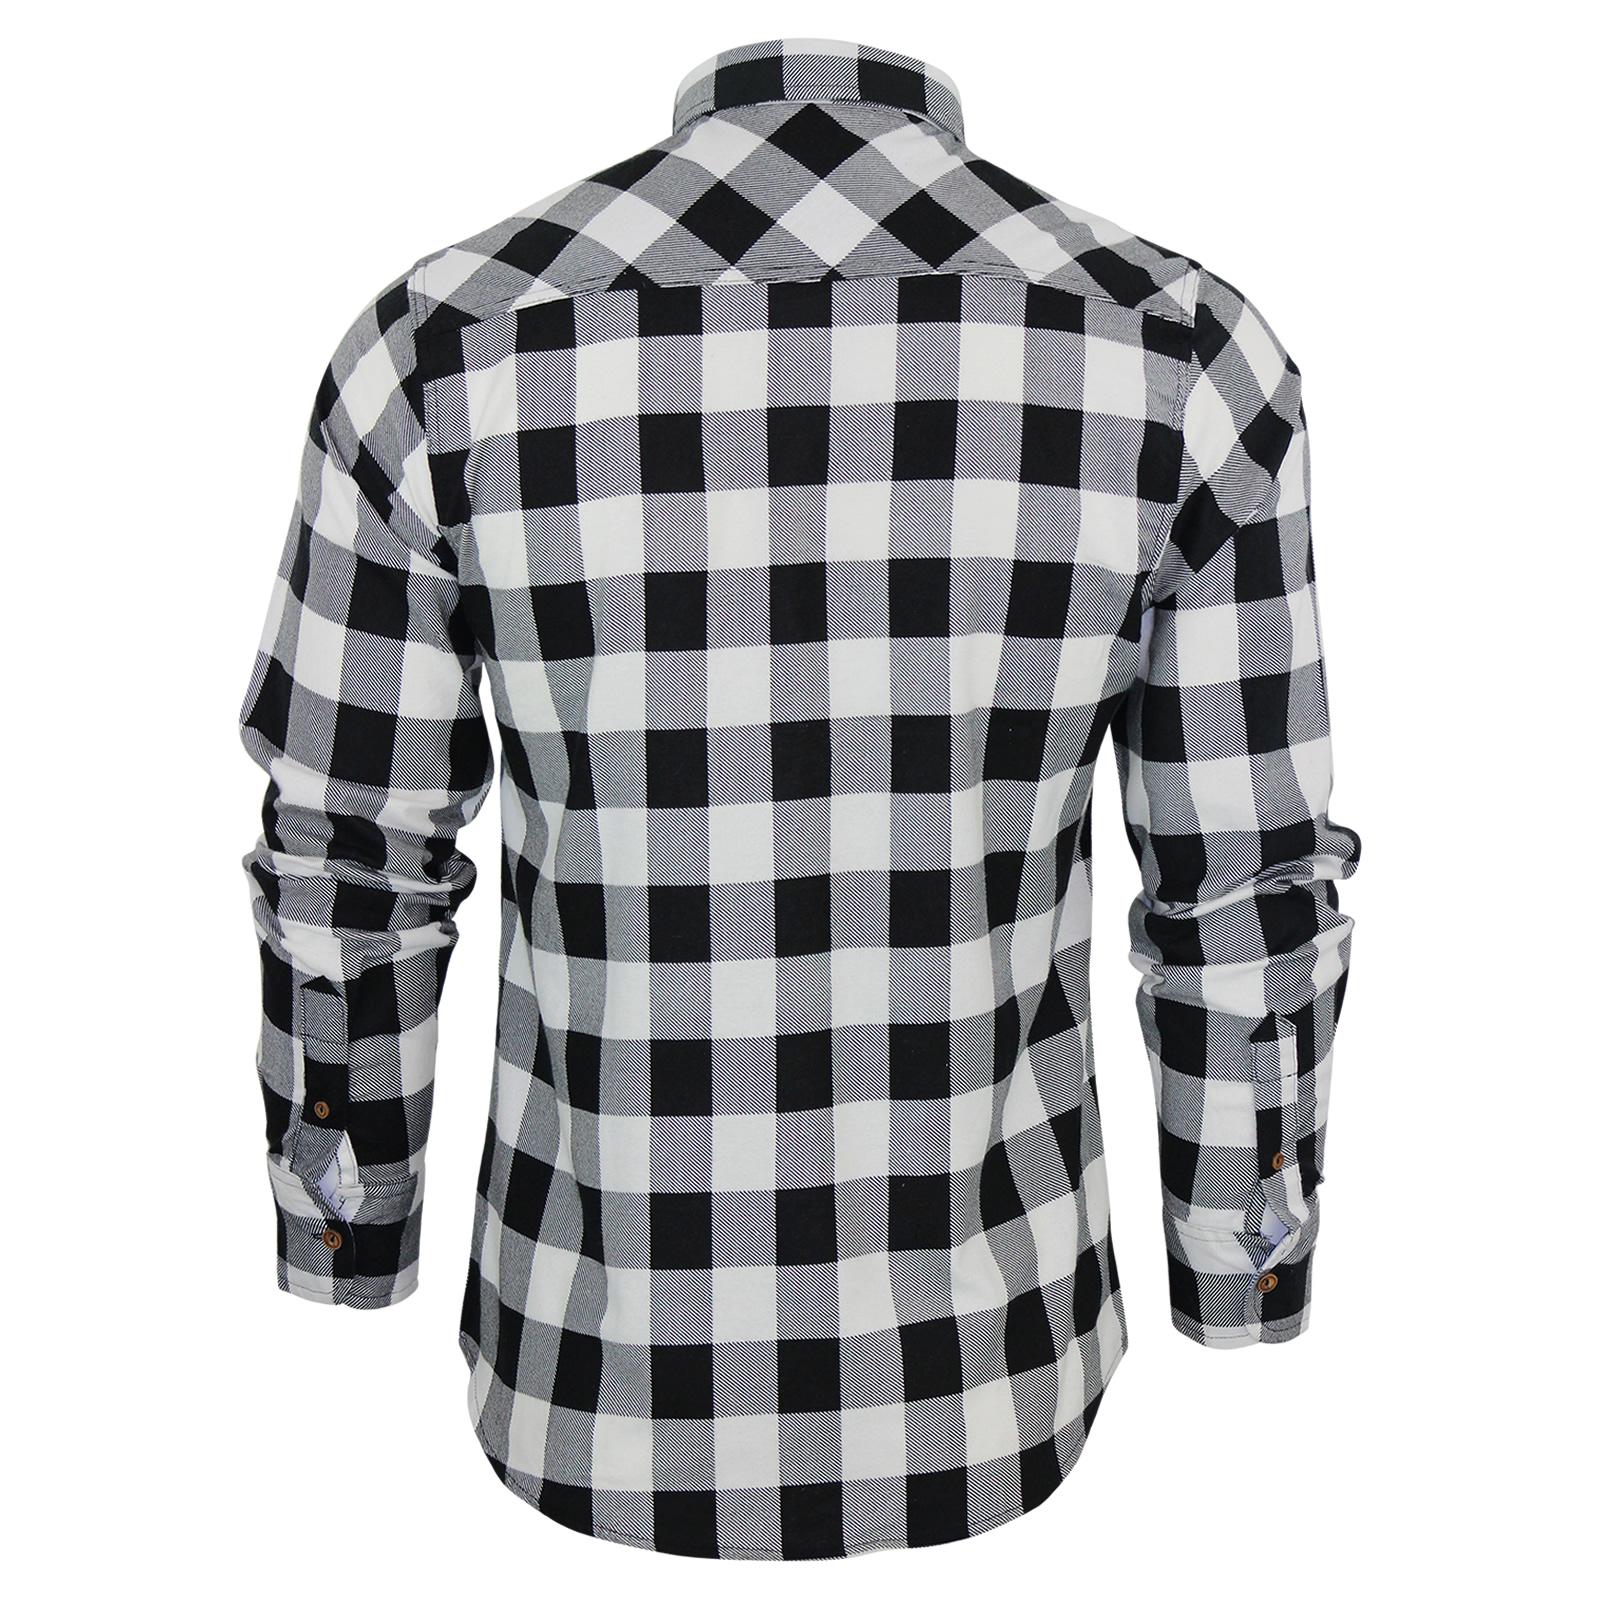 Mens Check Shirt Brave Soul Flannel Brushed Cotton Long Sleeve ...